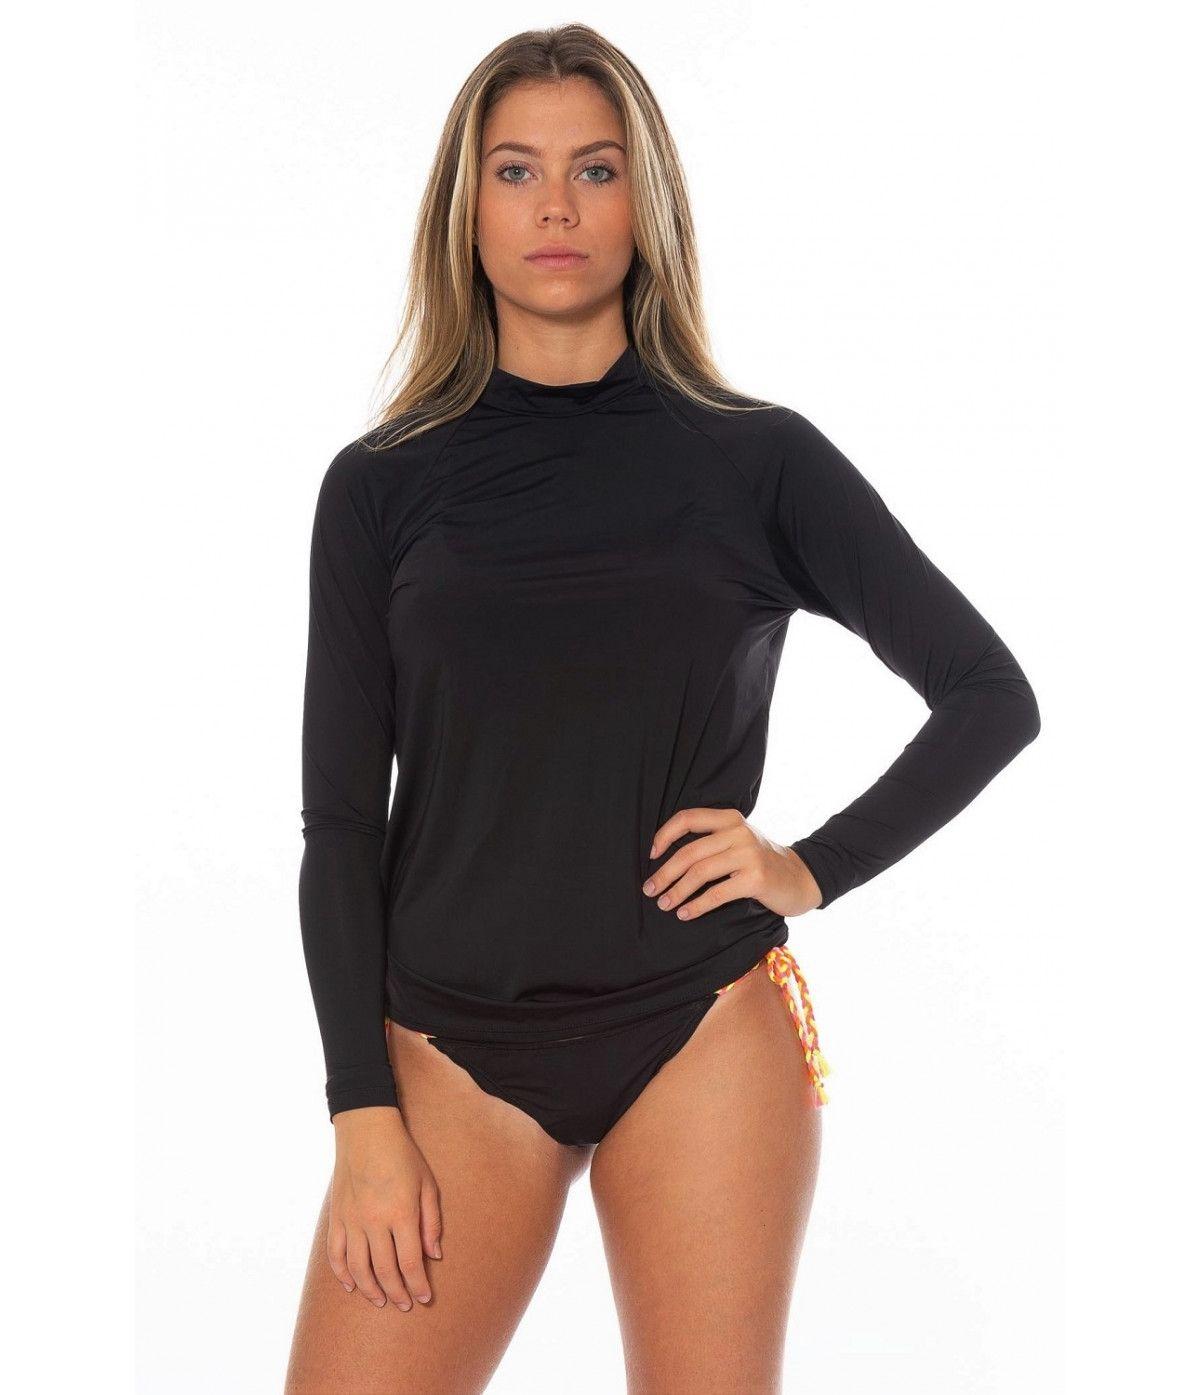 Camiseta Adulto Unisex UV50+